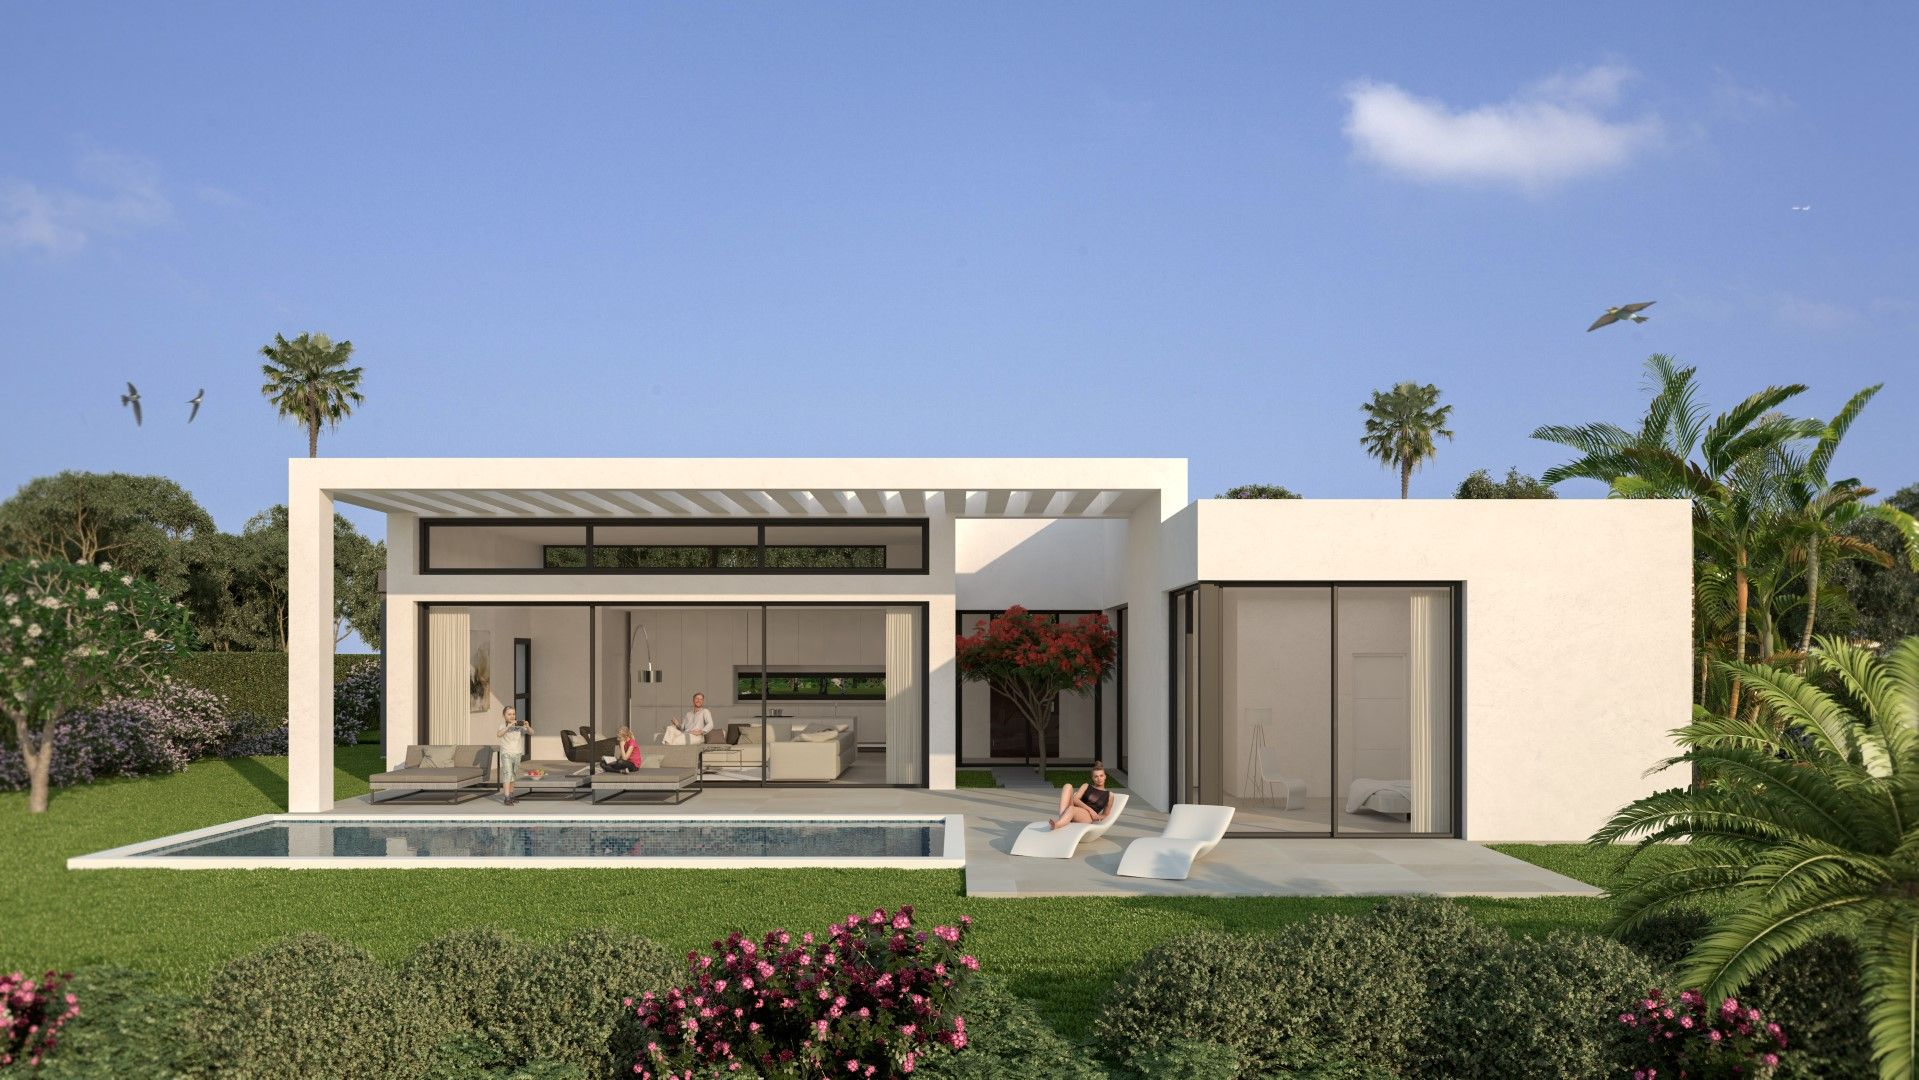 moderne neubau villen nahe atalaya golf in estepona ost zu verkaufen galerie - Moderne Villen